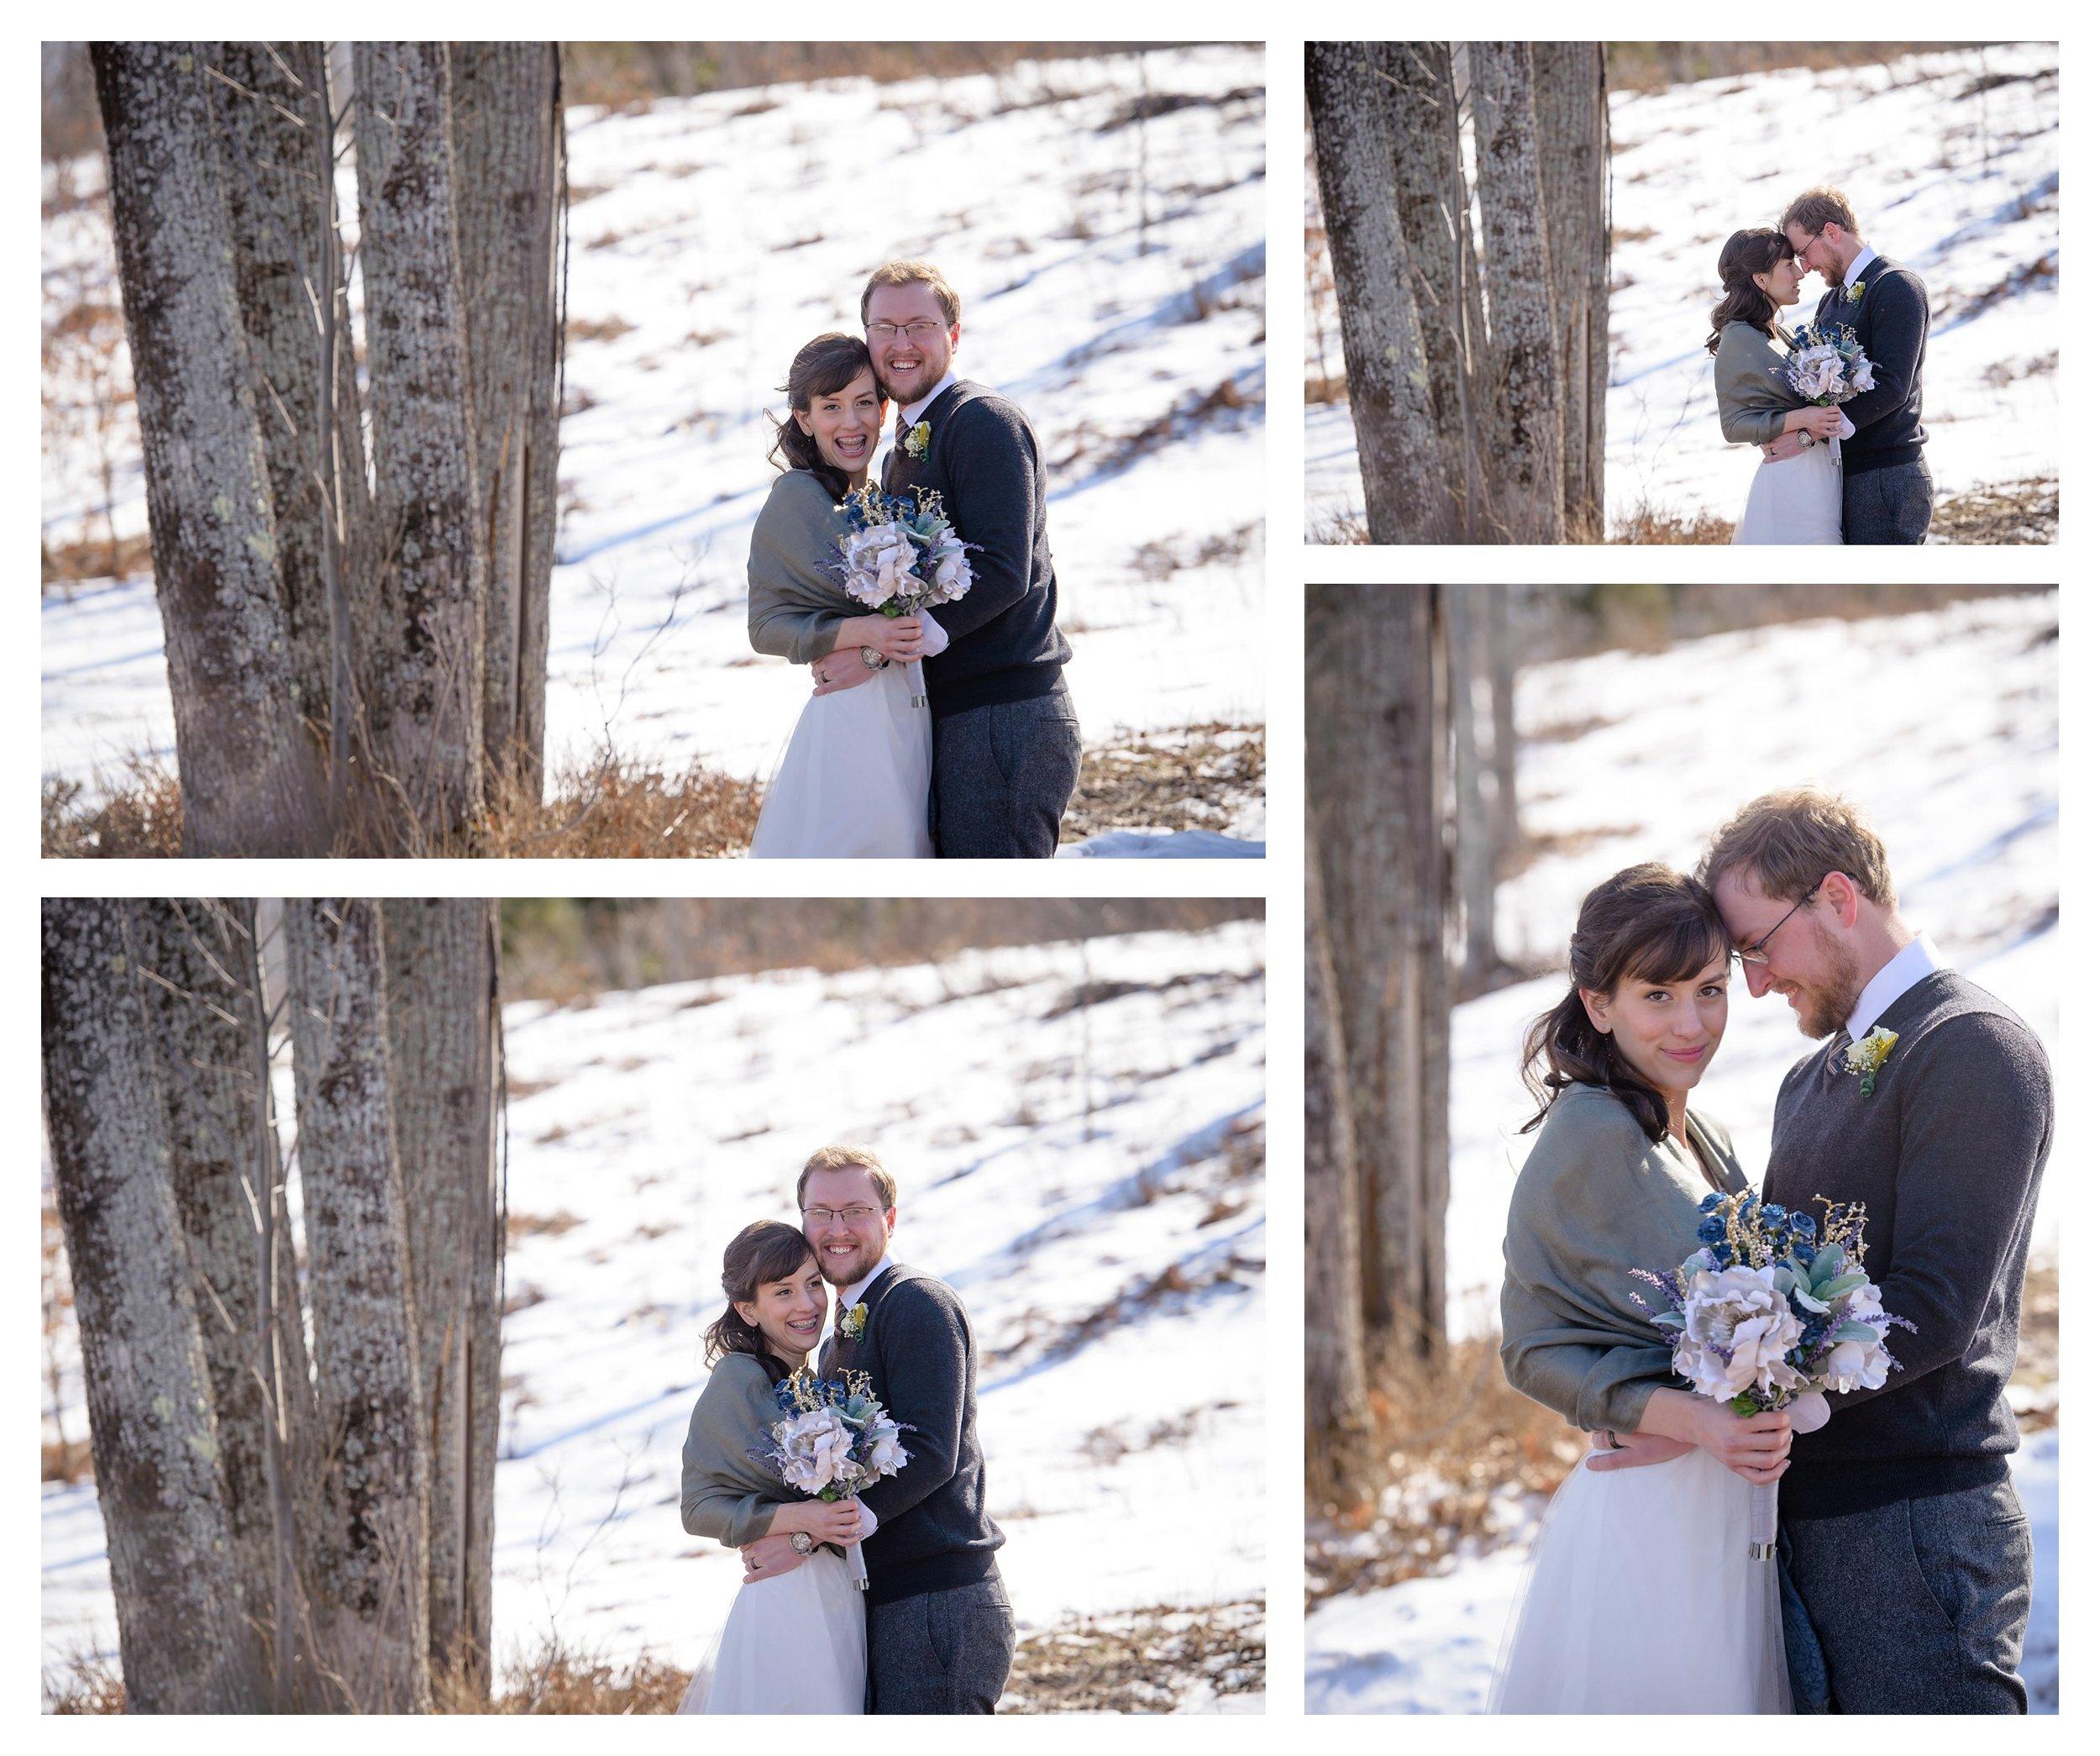 wisconsin wedding photographer timber baron inn bayfield wi ps 139 photography jen jensen_0216.jpg